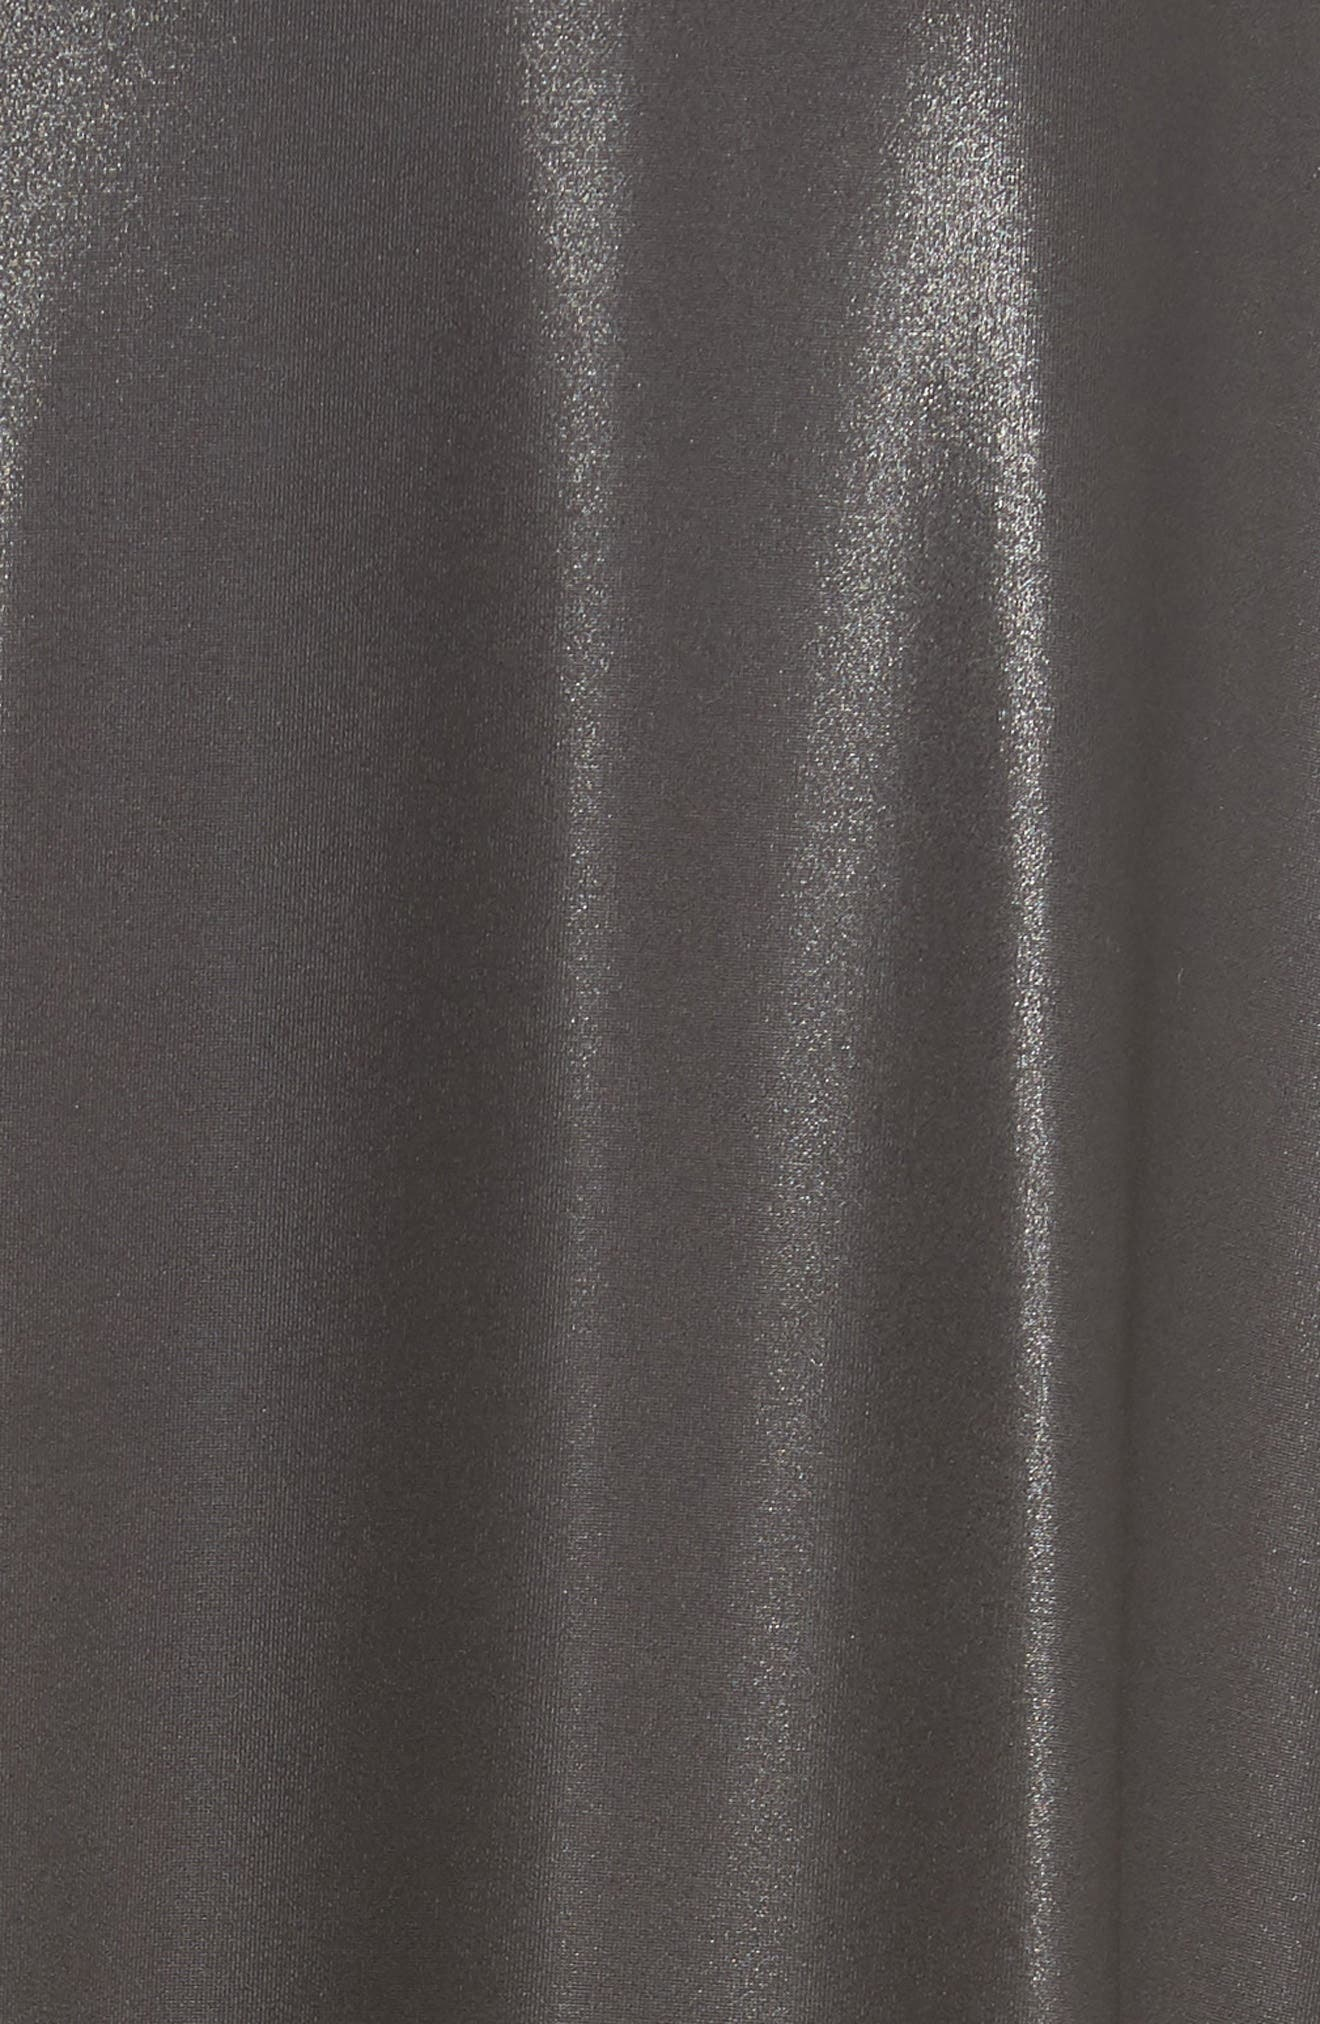 Coated Turtleneck Dress,                             Alternate thumbnail 5, color,                             001